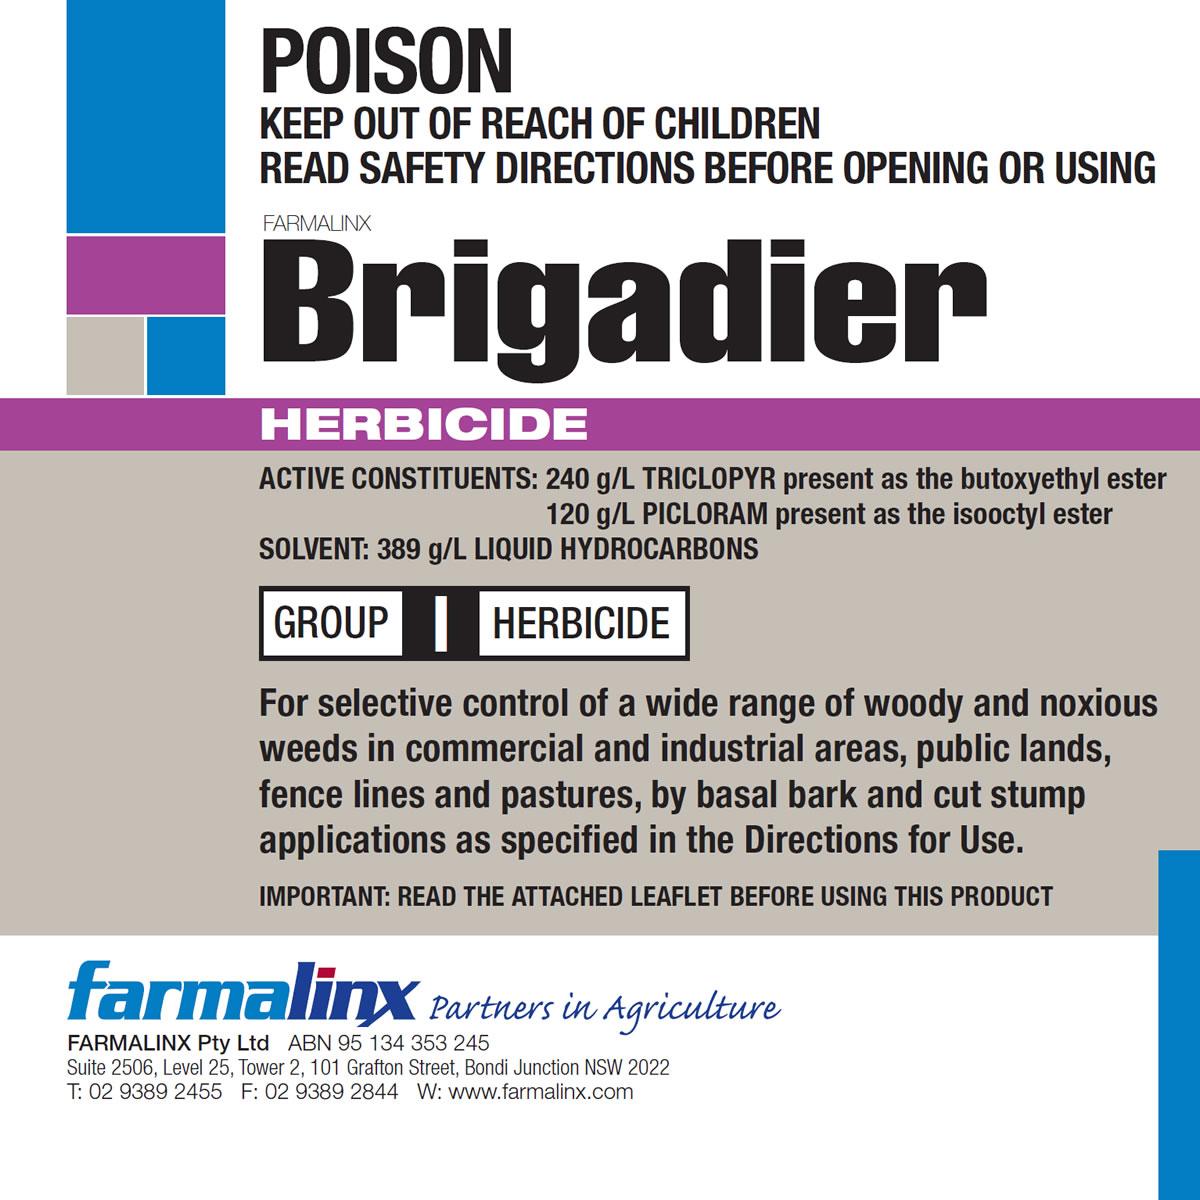 Farmalinx: Crop Protection Chemicals